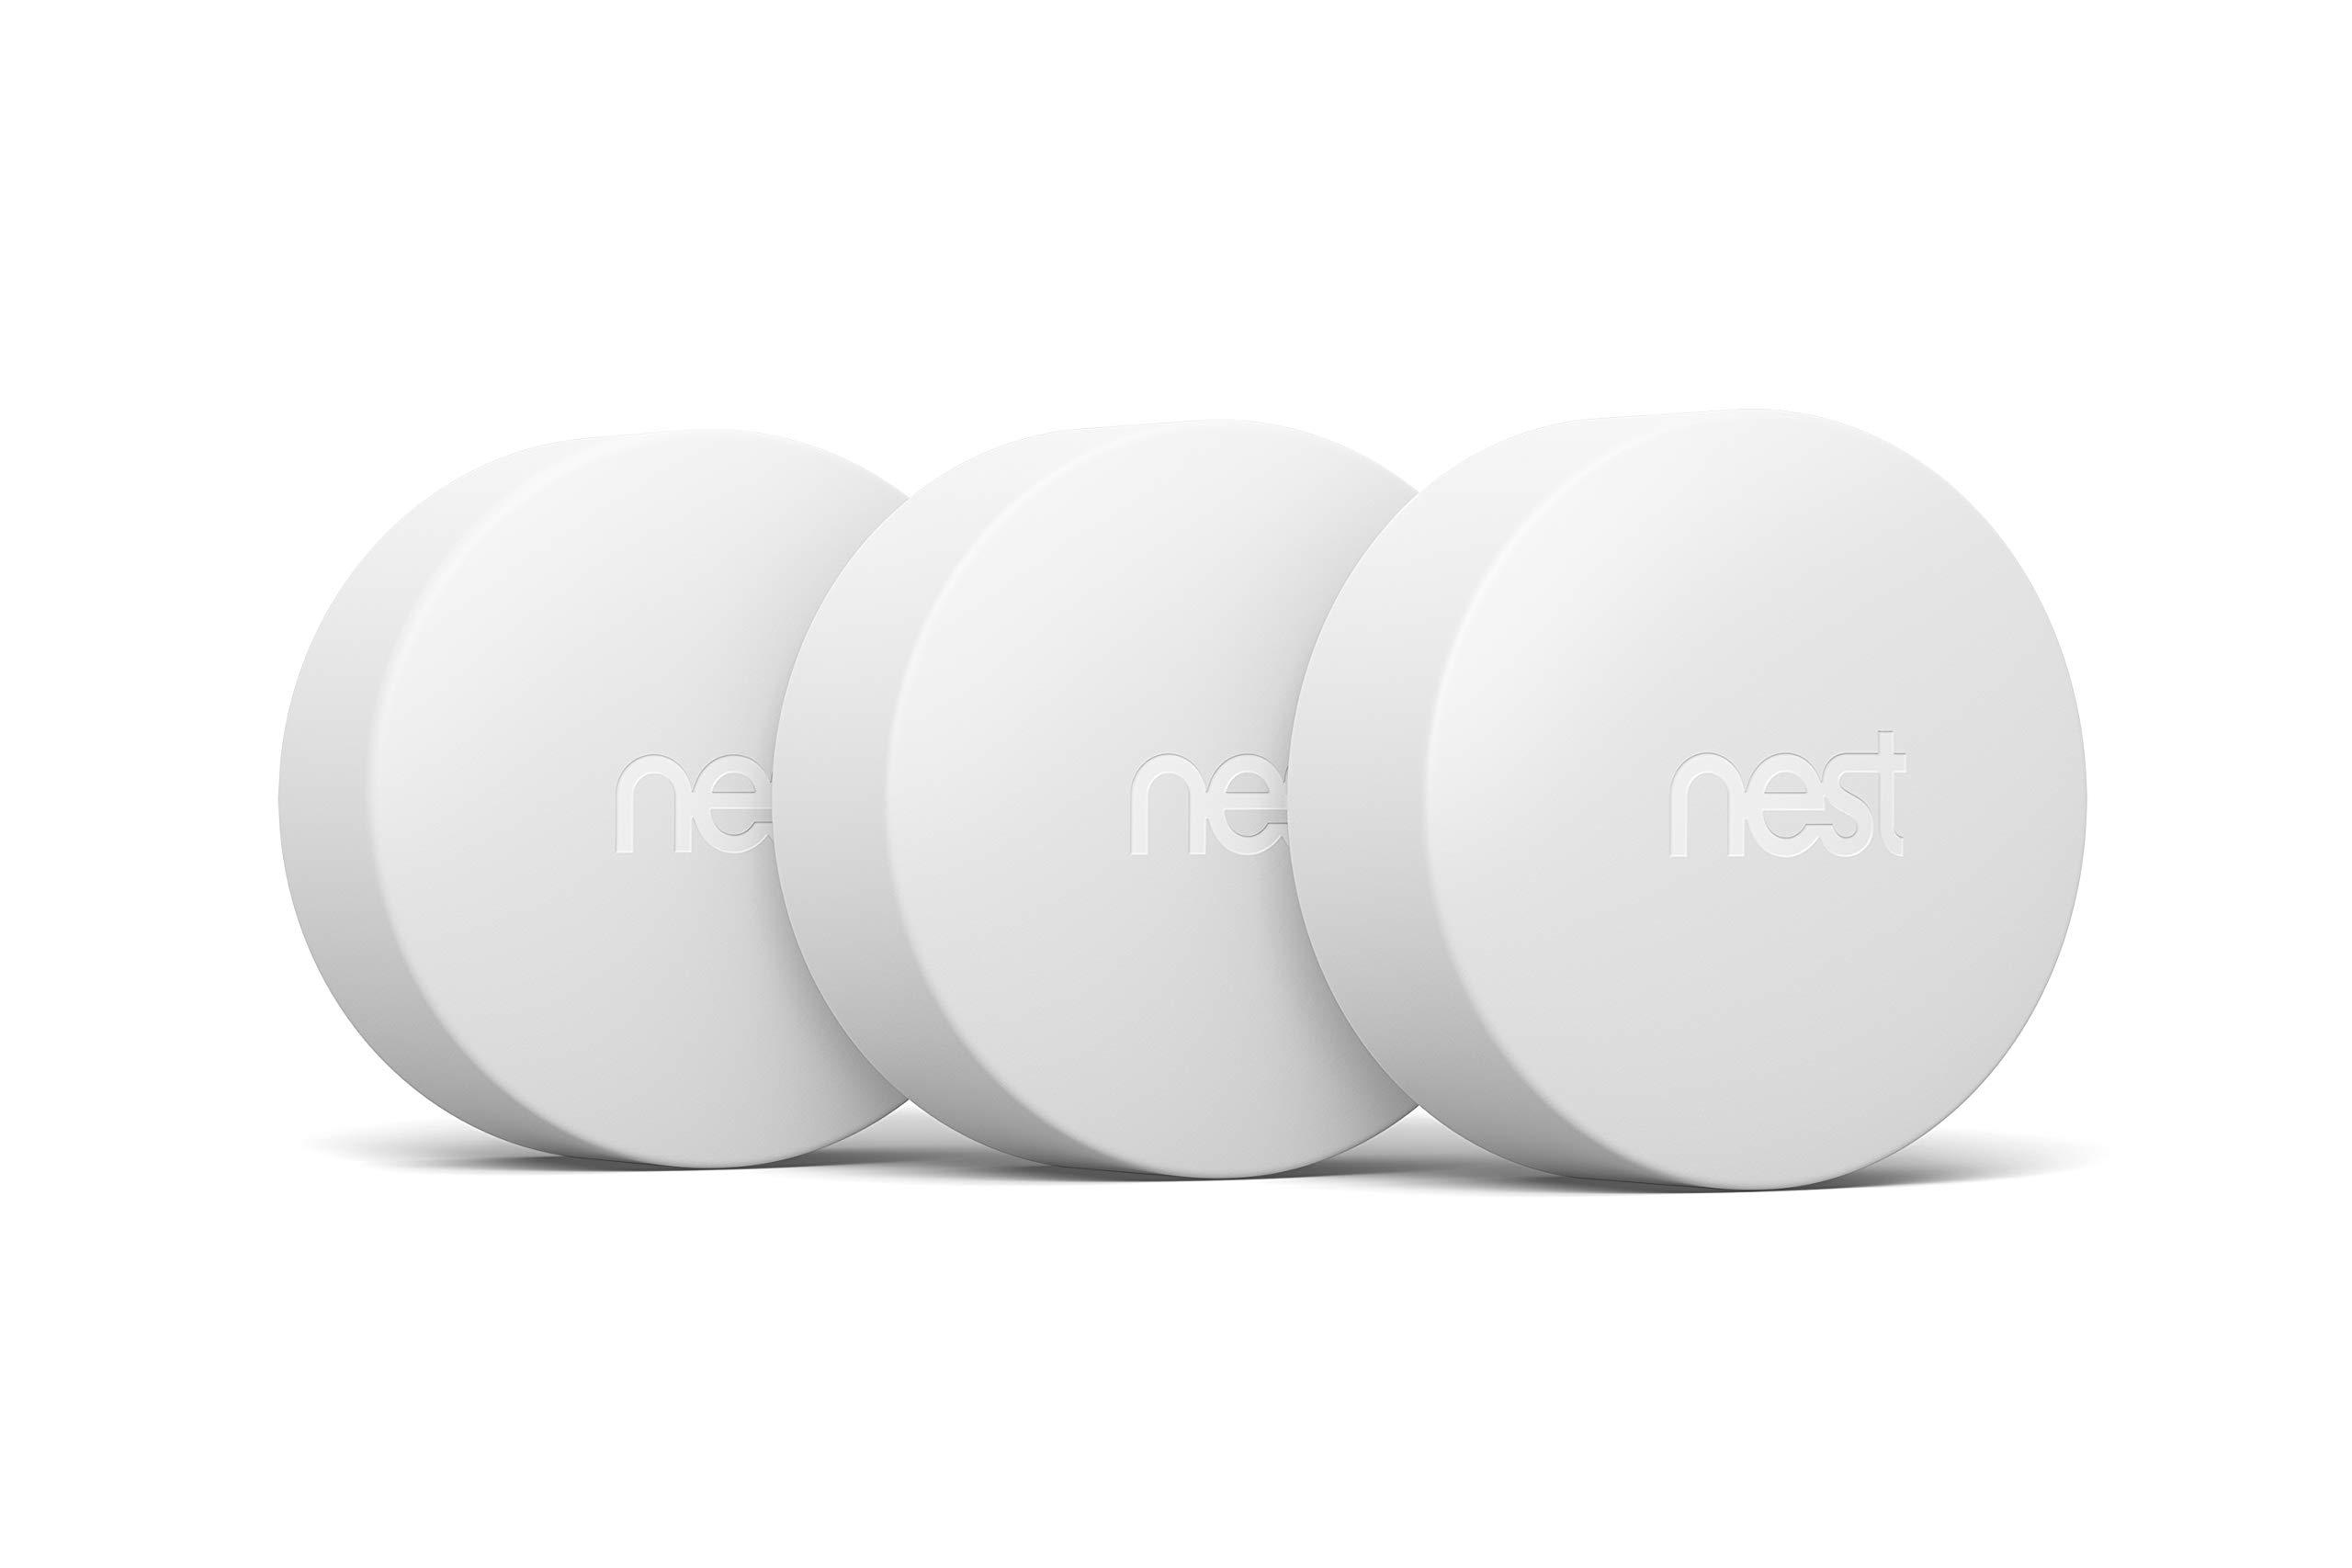 Google, T5001SF, Nest Temperature Sensor, White, 3 Pack by Google